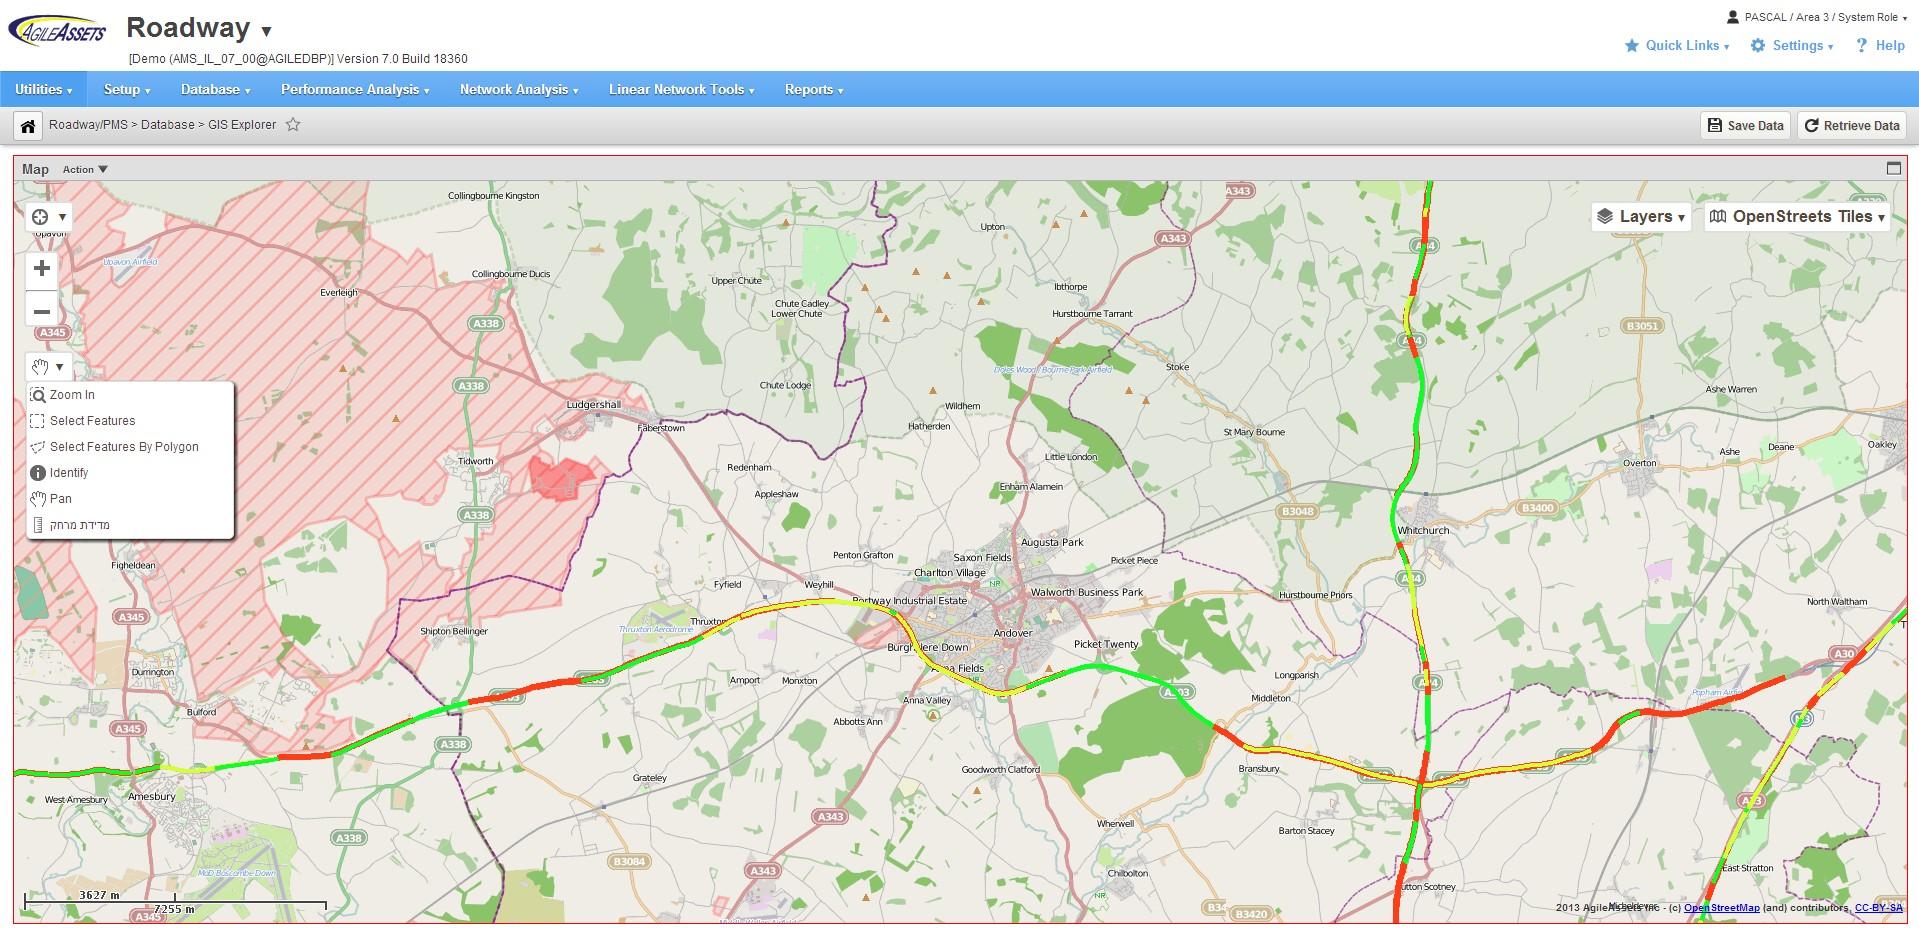 AgileAssets Software - Roadway map